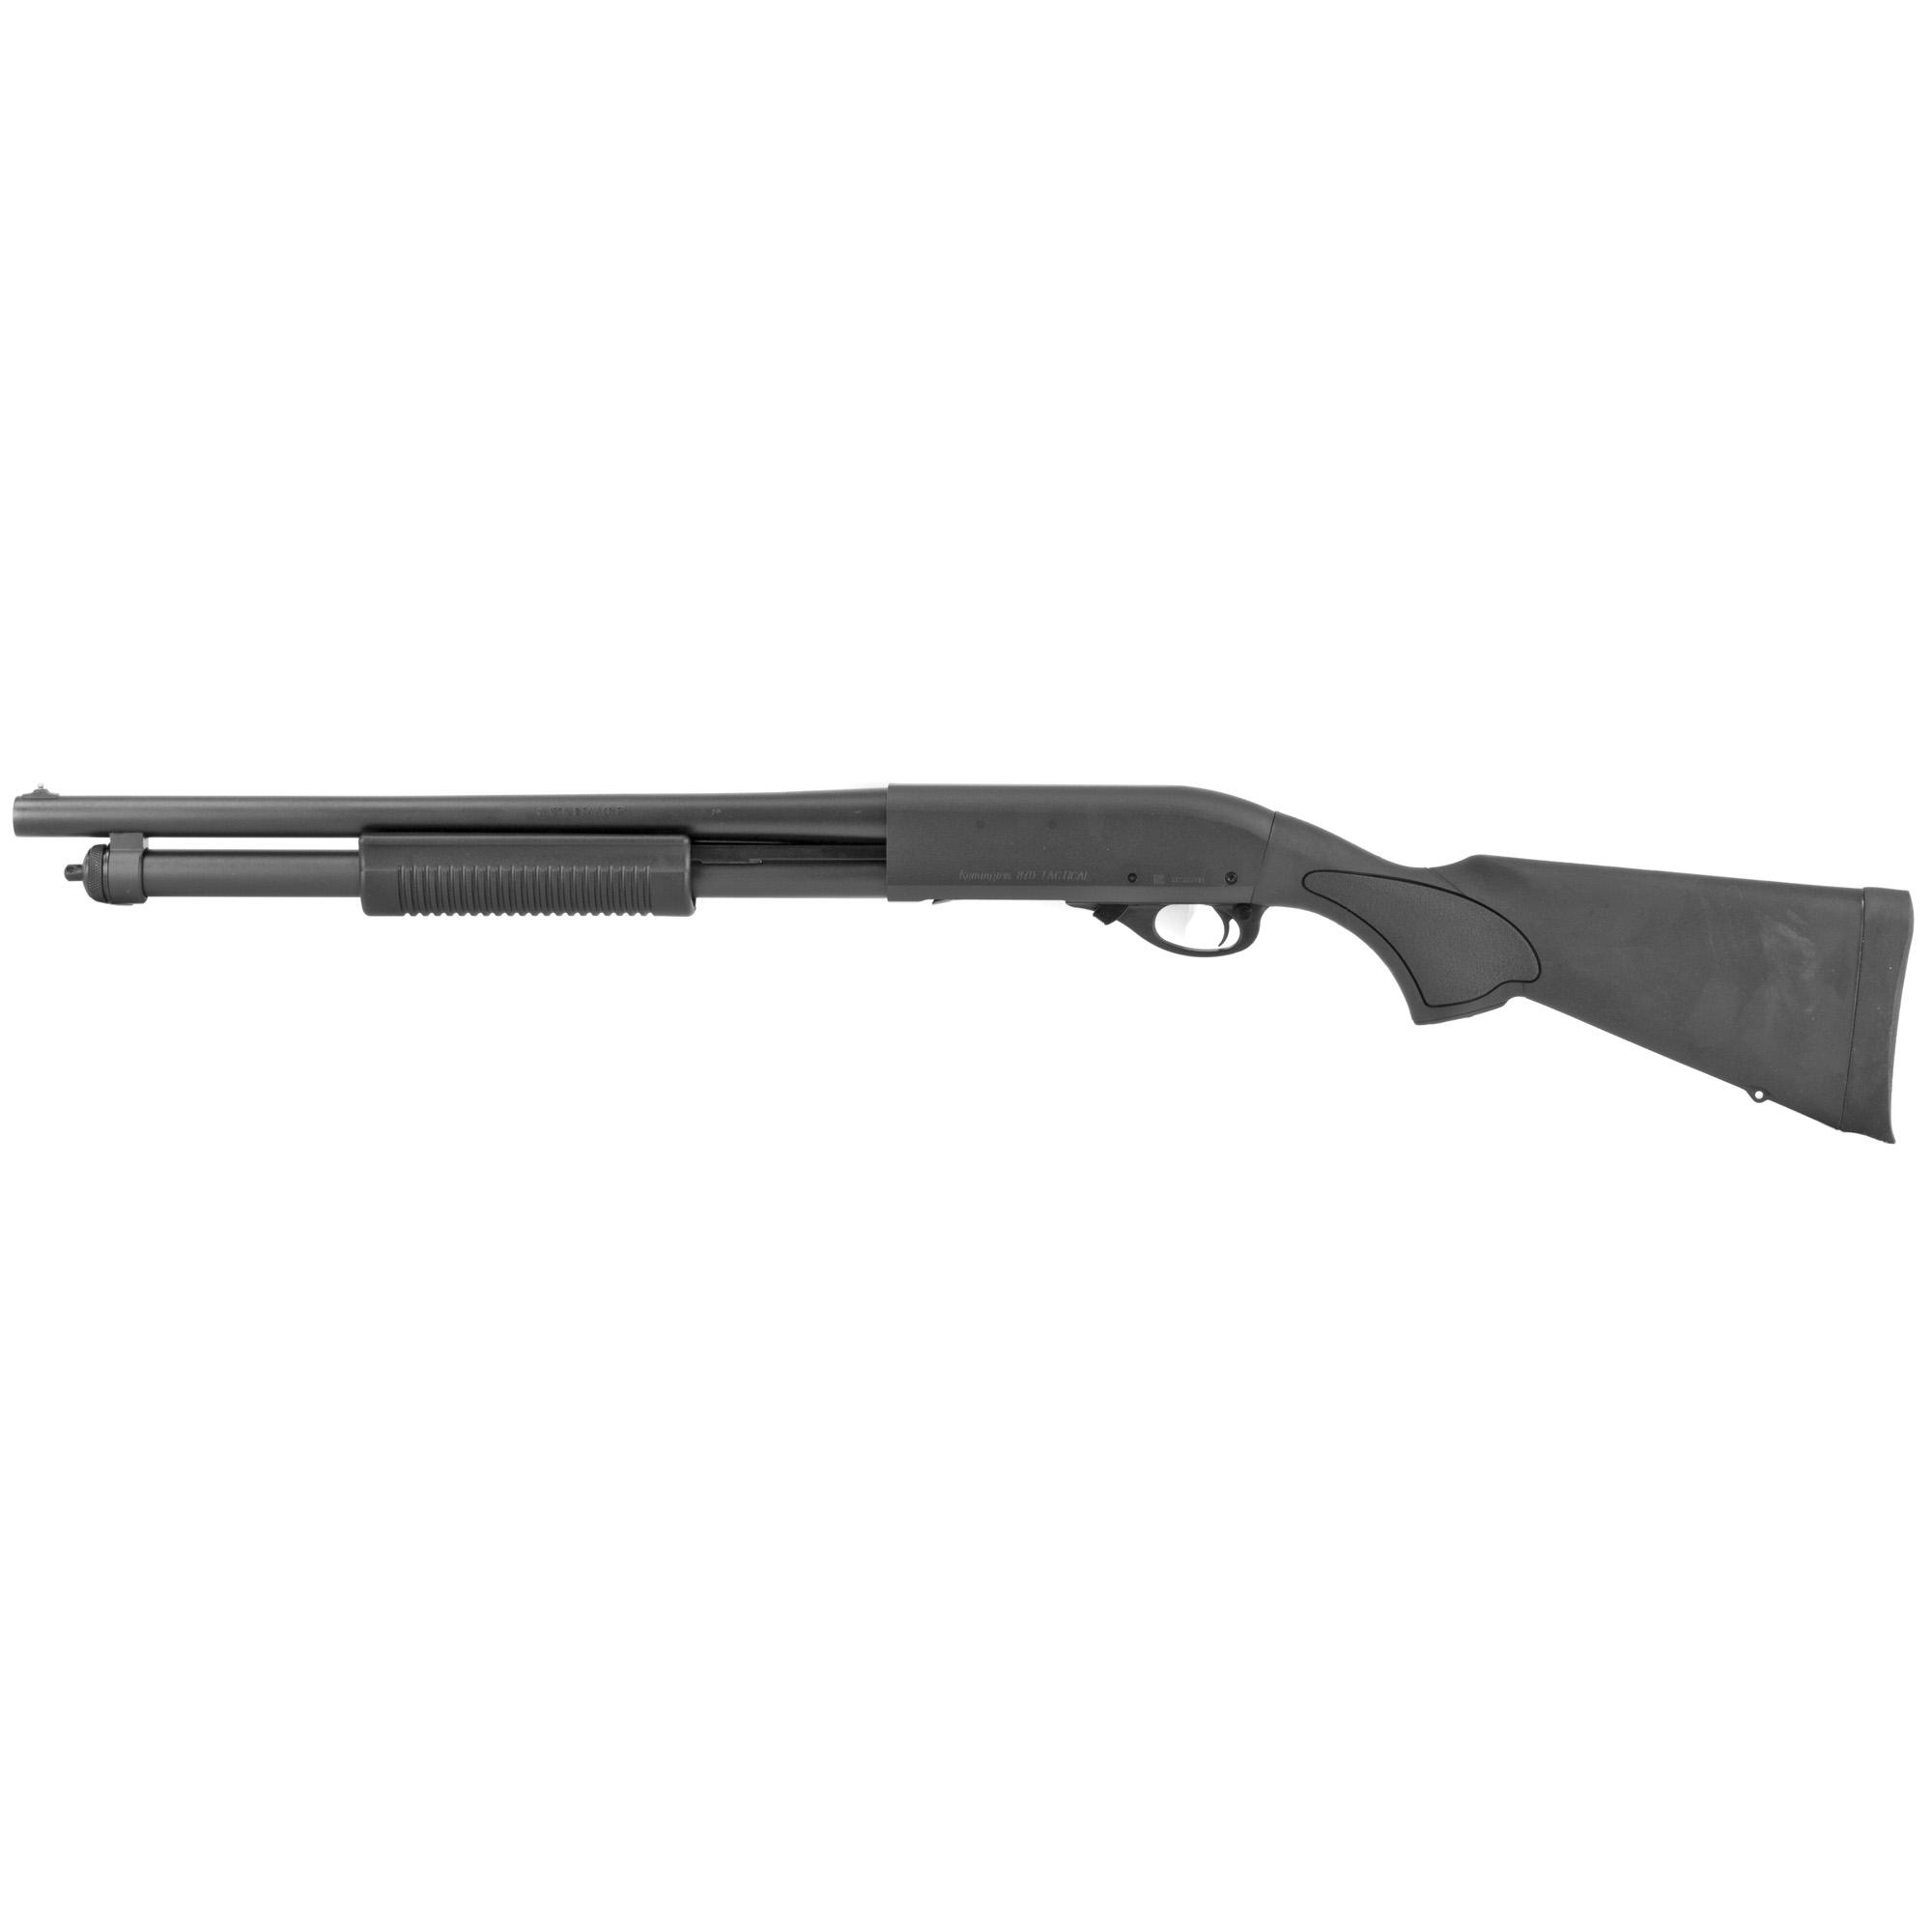 https://cityarsenal.com/product/remington-870-tactical-12ga-pump-shotgun-black-r25077/